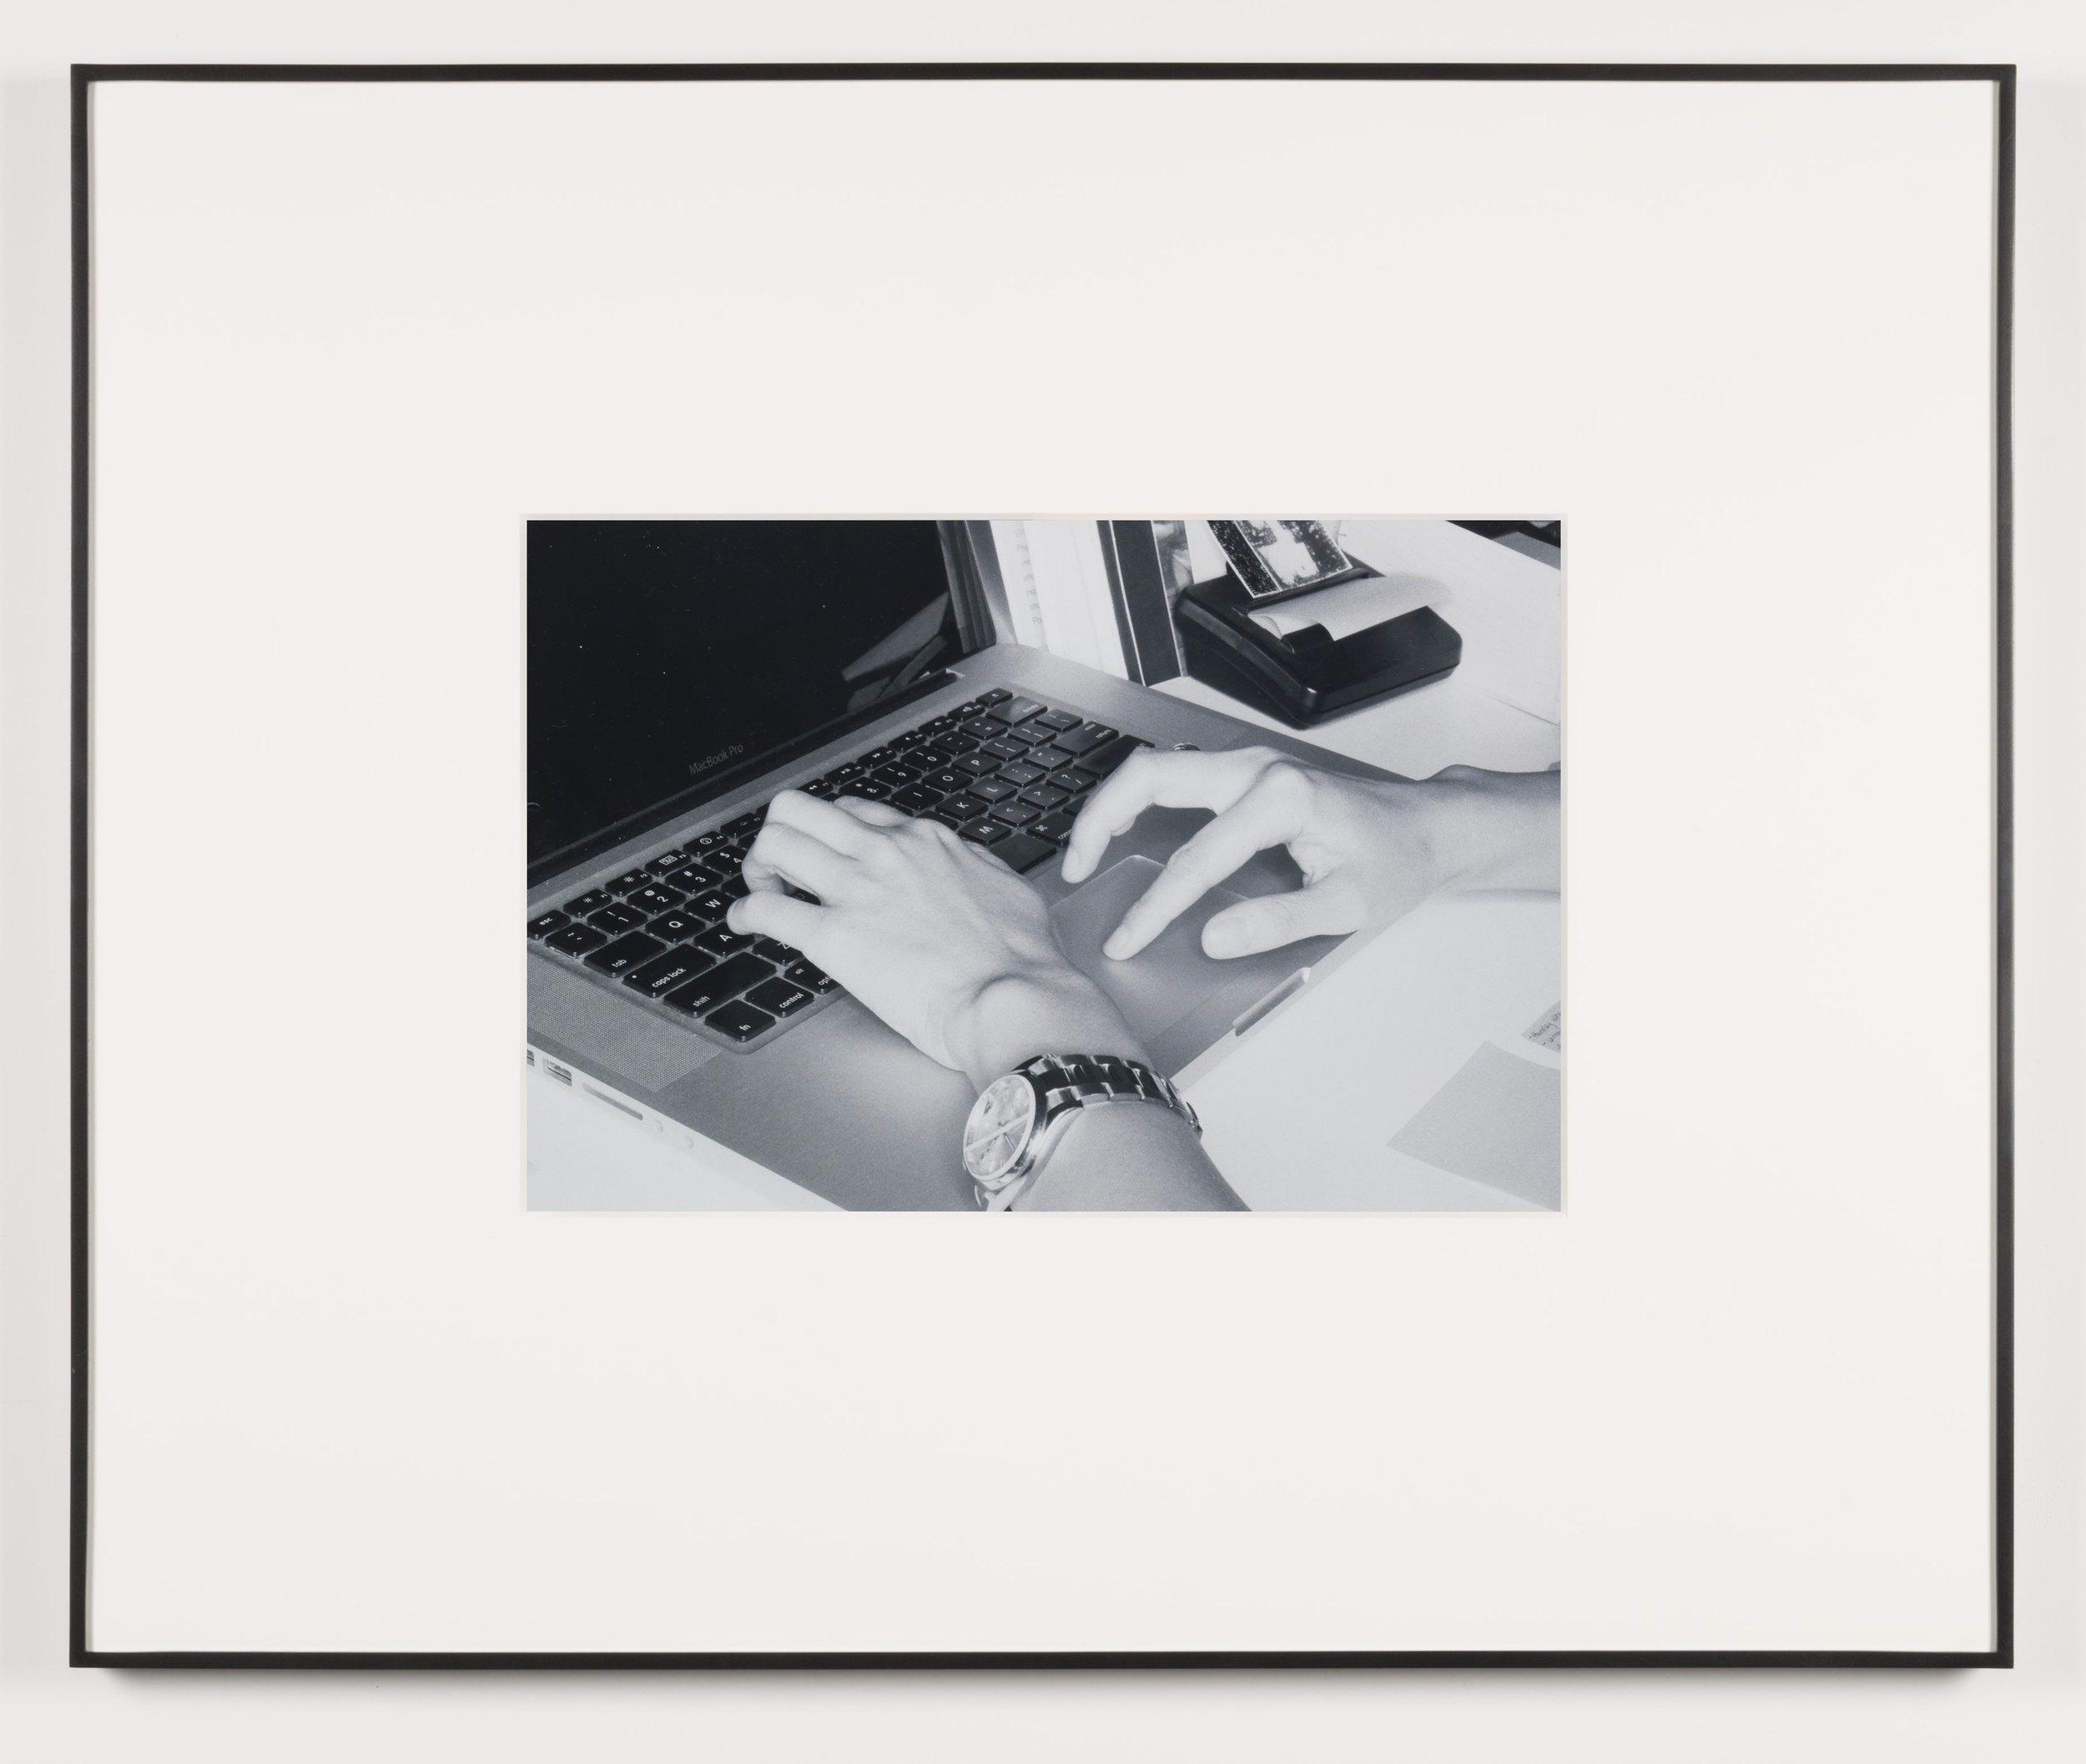 Der Spaßvogel (Los Angeles, California, August 30, 2011), Frame No. 18    2014   Black and white digital fiber print  13 1/2 x20 inches   Art Handling, 2011–